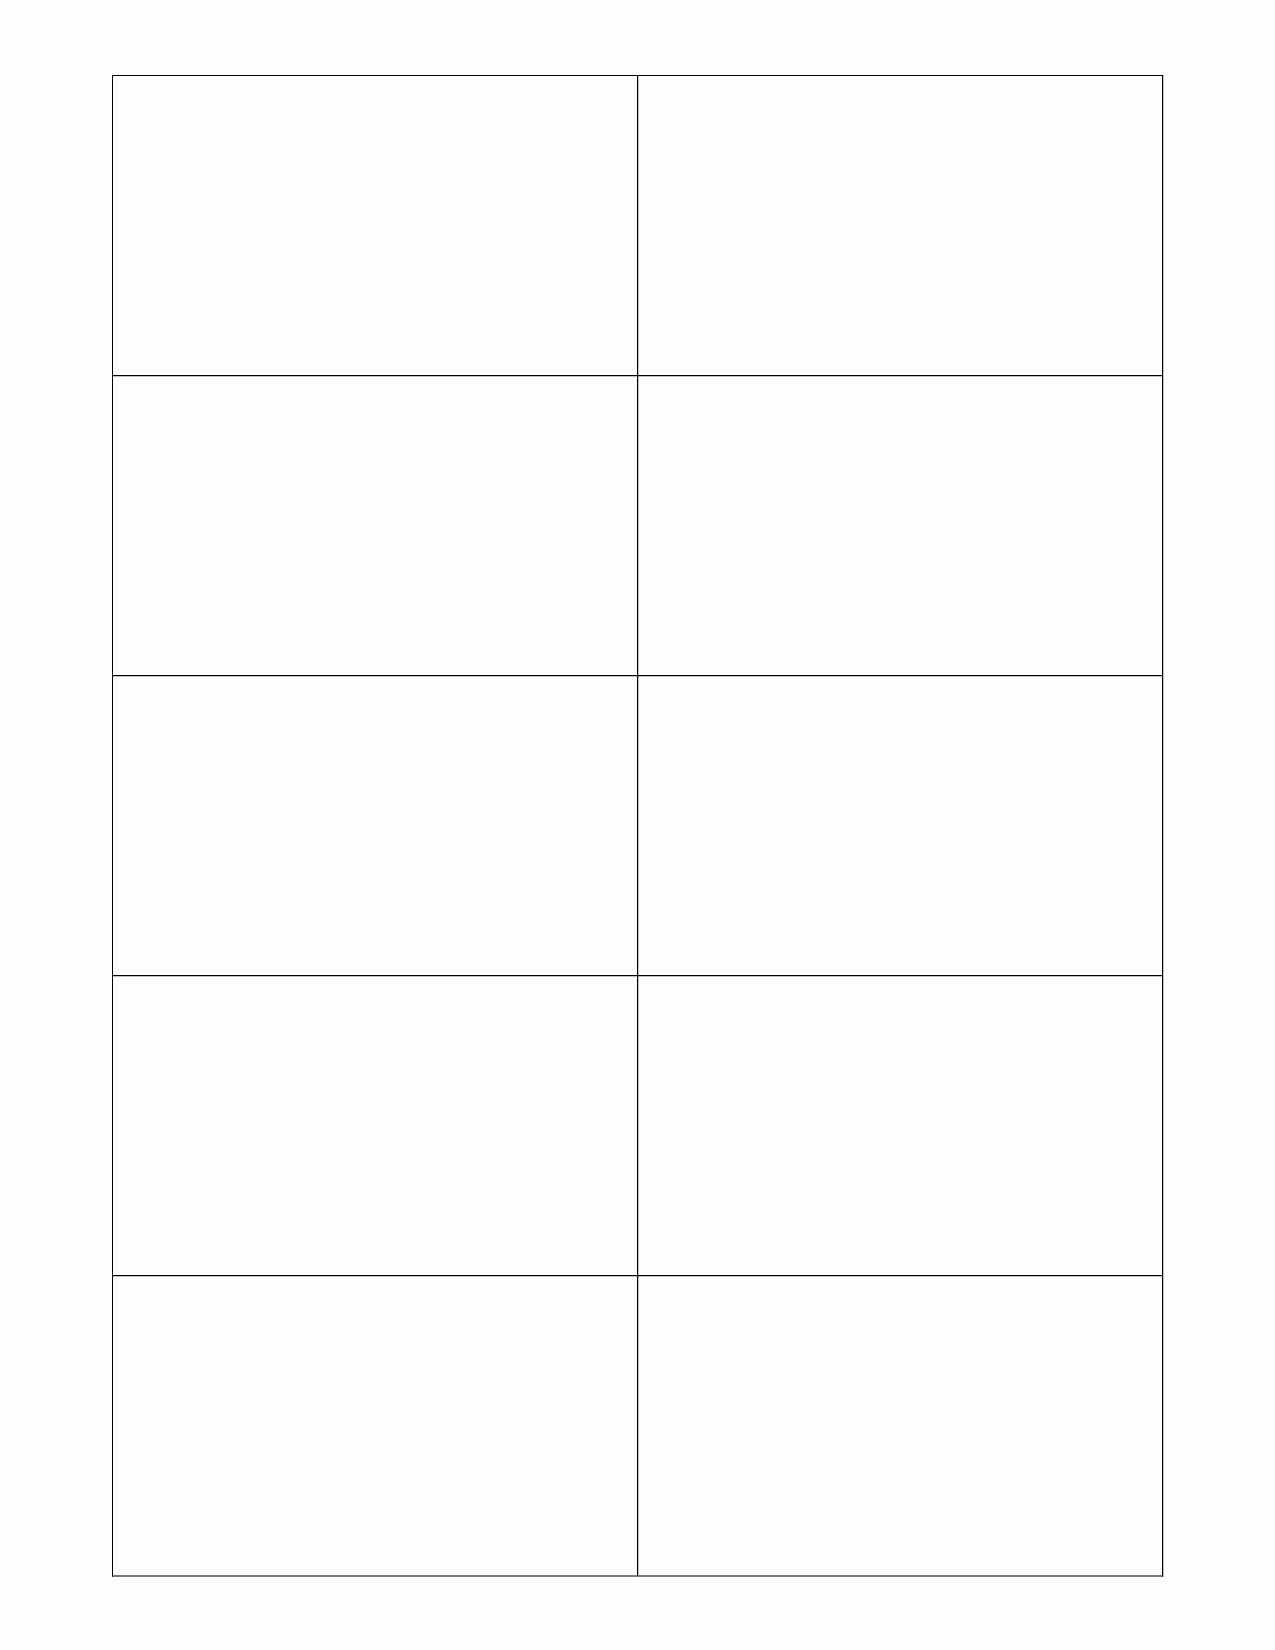 Microsoft Business Card Templates Free Inspirational Blank Business Card Template Beepmunk